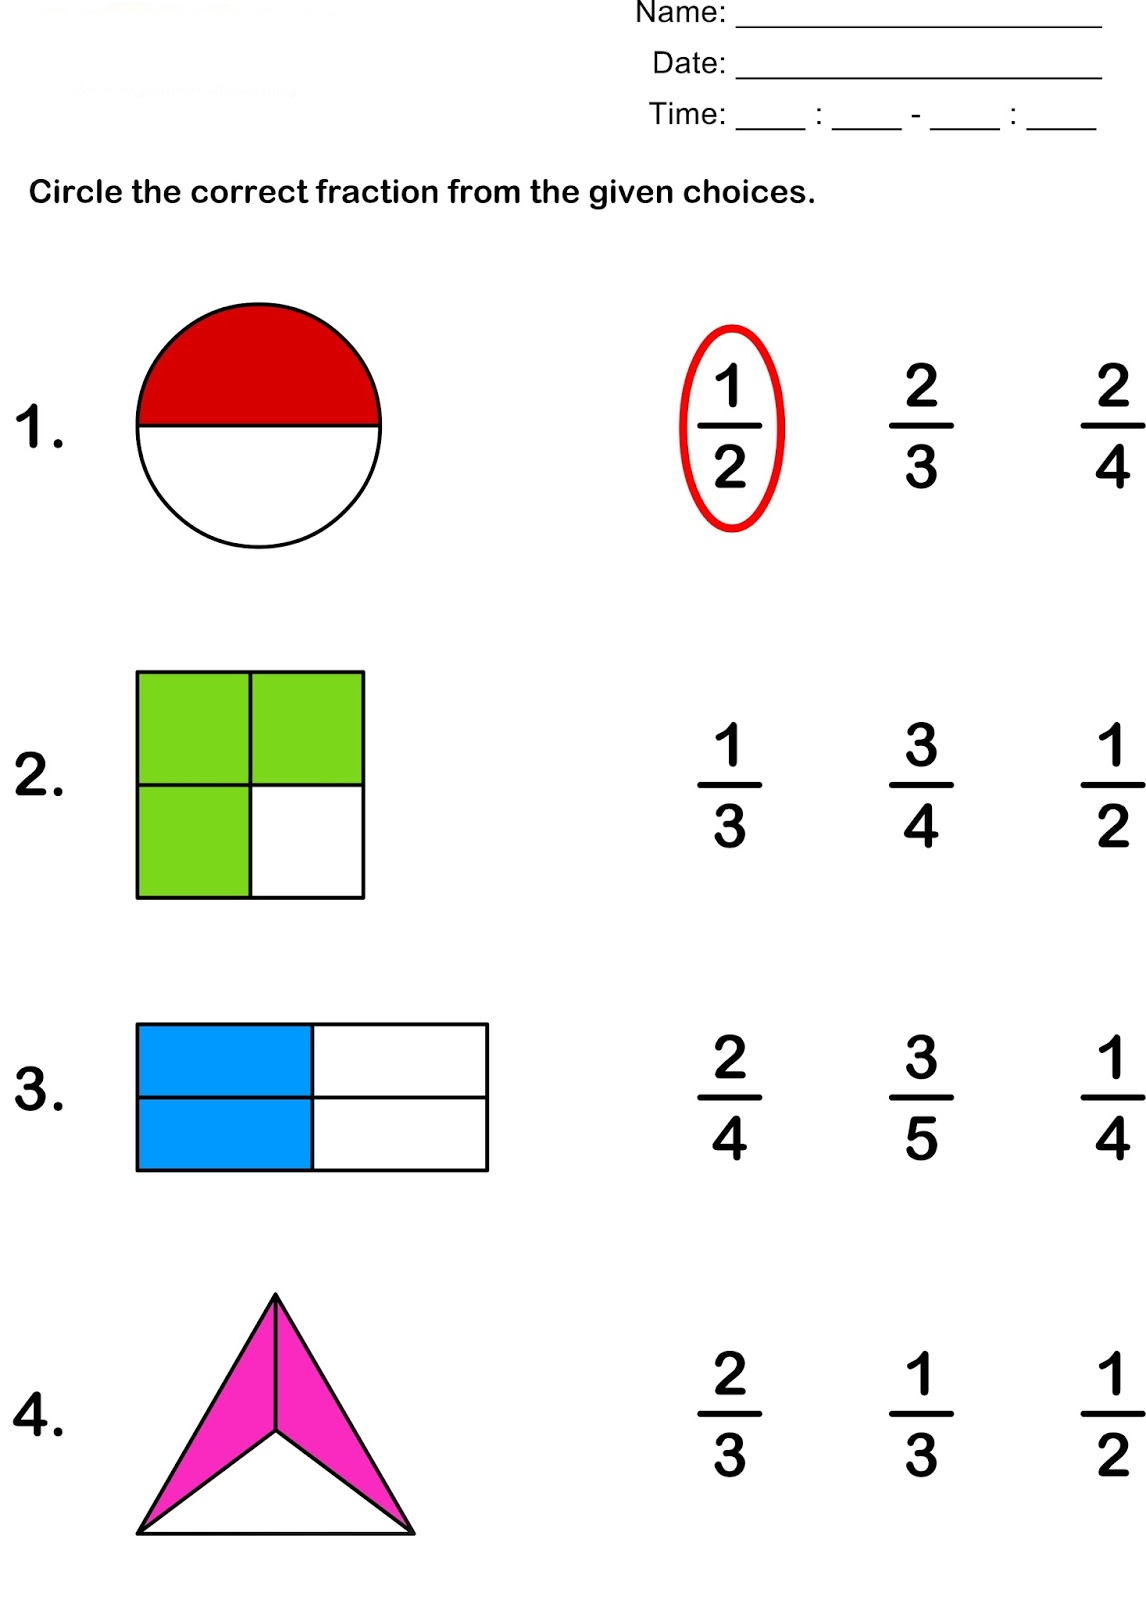 small resolution of Worksheet For Grade 5 Araling Panlipunan   Printable Worksheets and  Activities for Teachers